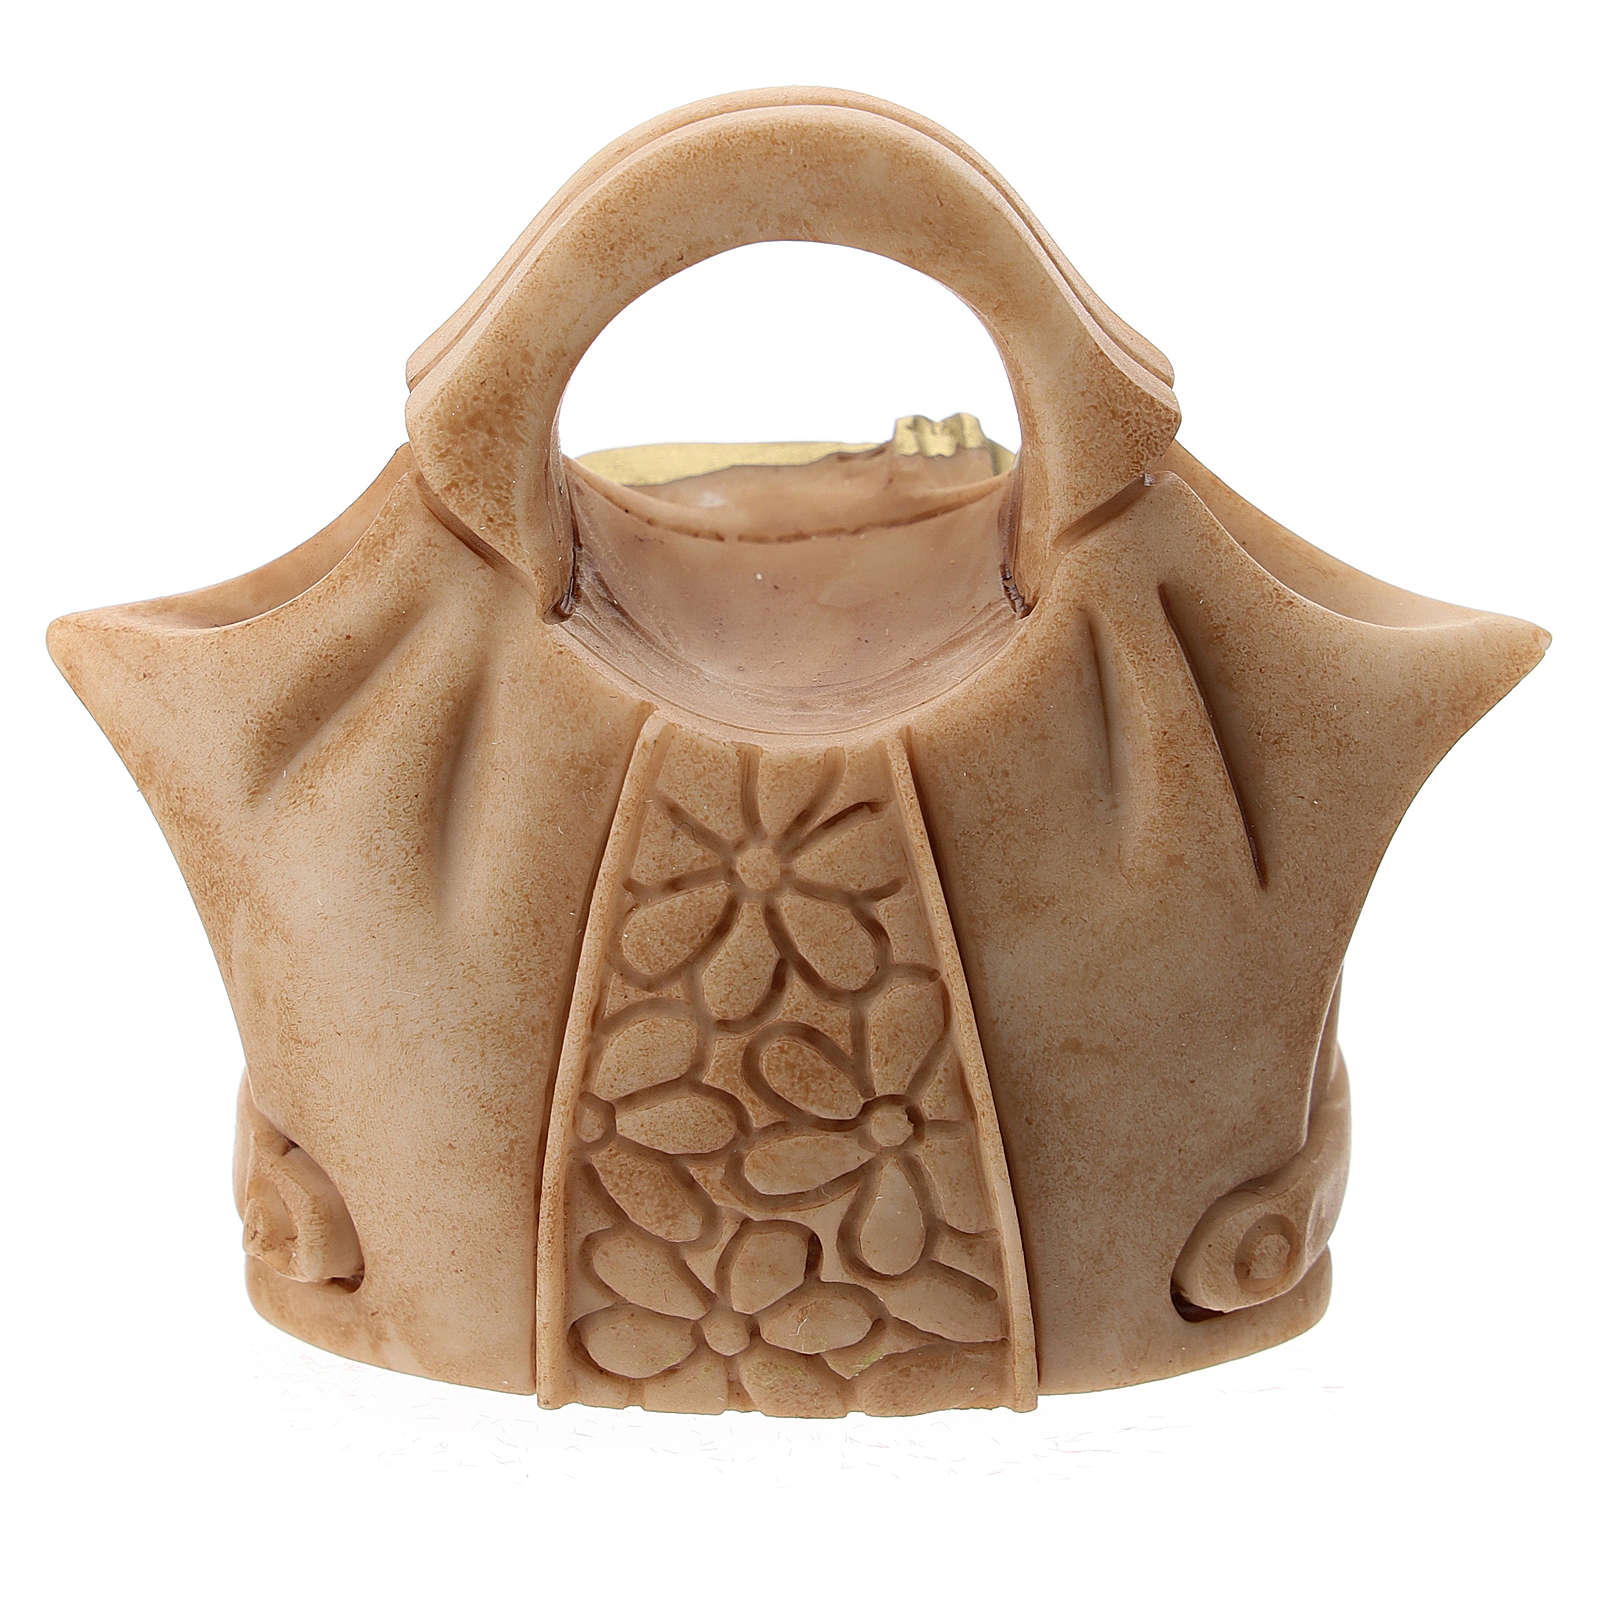 Resin handbag with Holy Family 5 cm 3